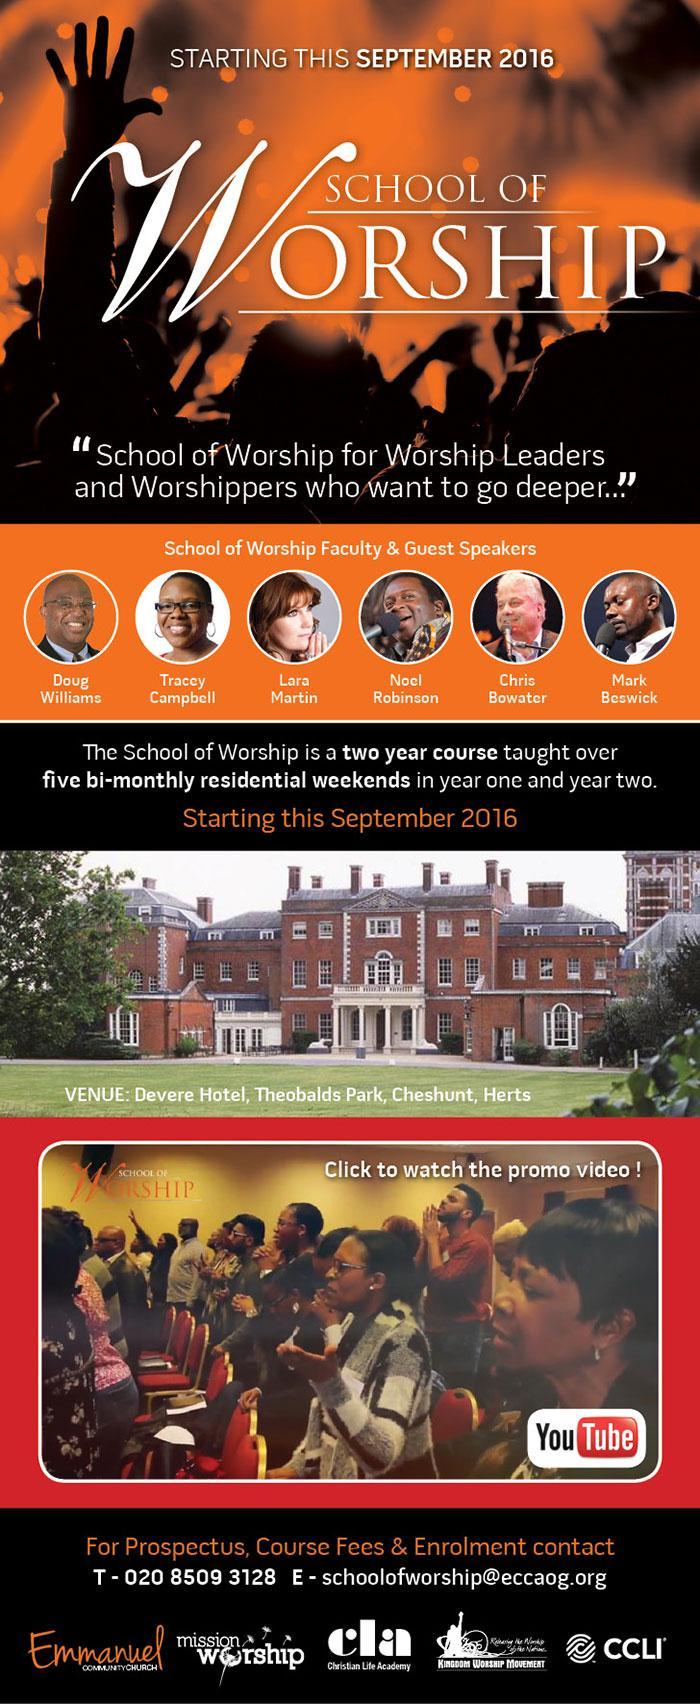 School of Worship May 2018 - John Andrews